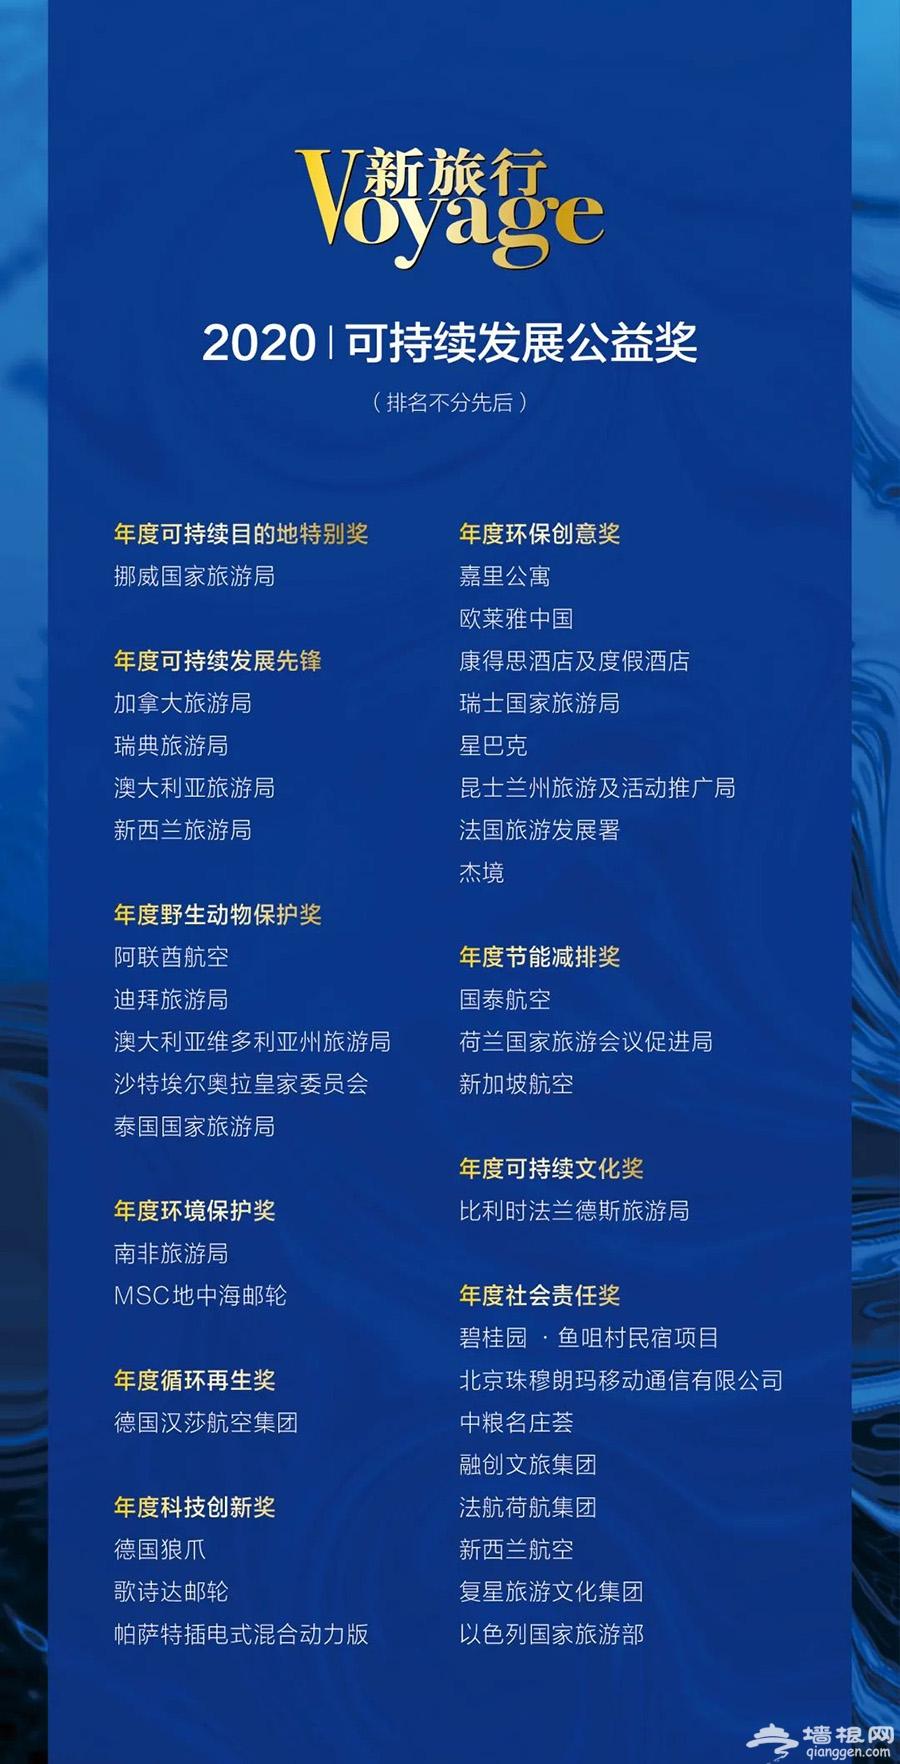 《Voyage新旅行》2020可持续发展公益奖榜单发布[墙根网]